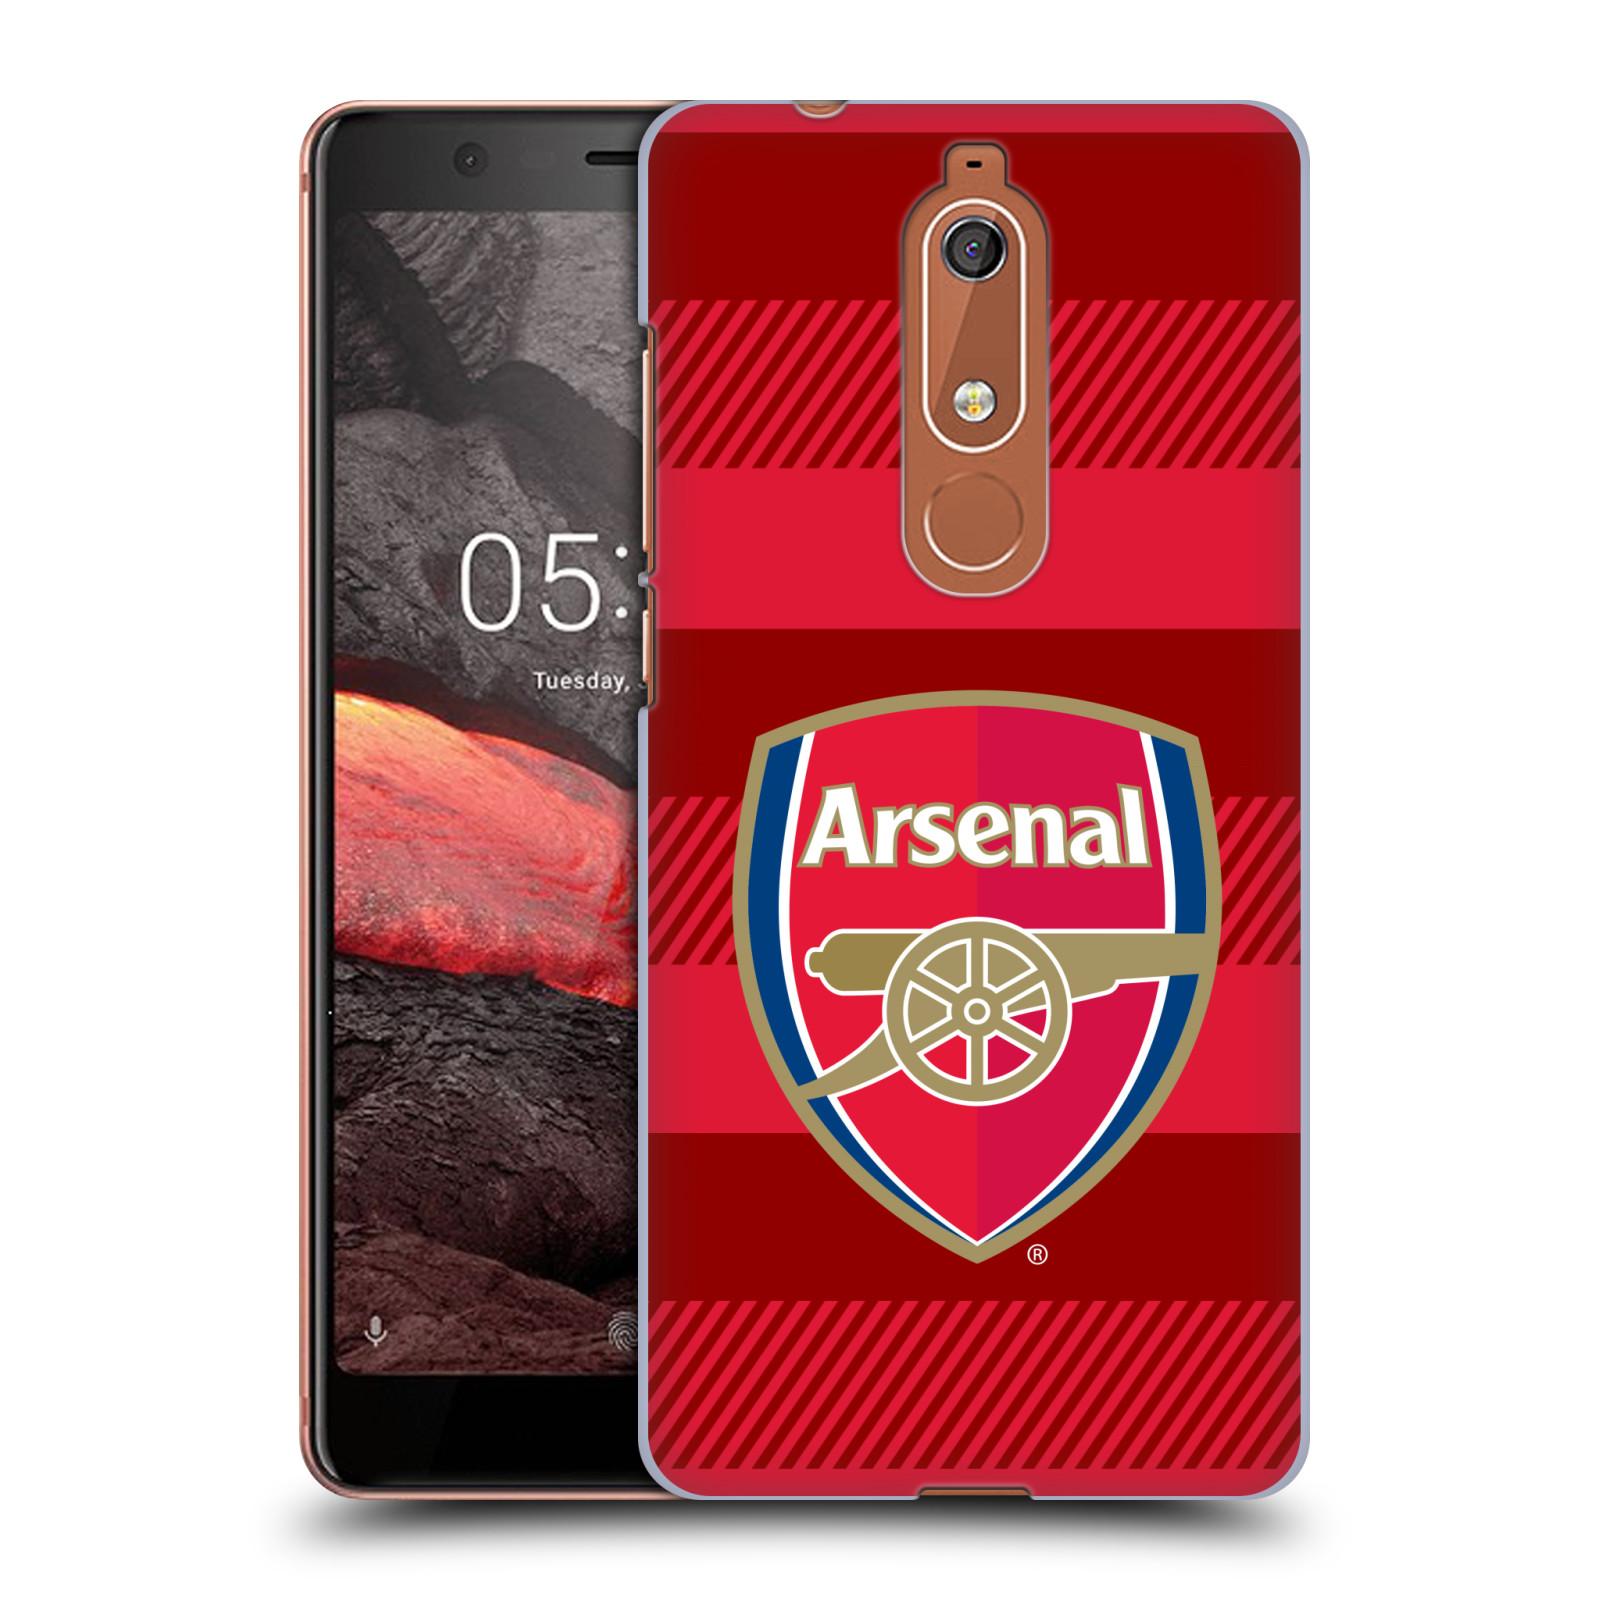 Plastové pouzdro na mobil Nokia 5.1 - Head Case - Arsenal FC - Logo s pruhy